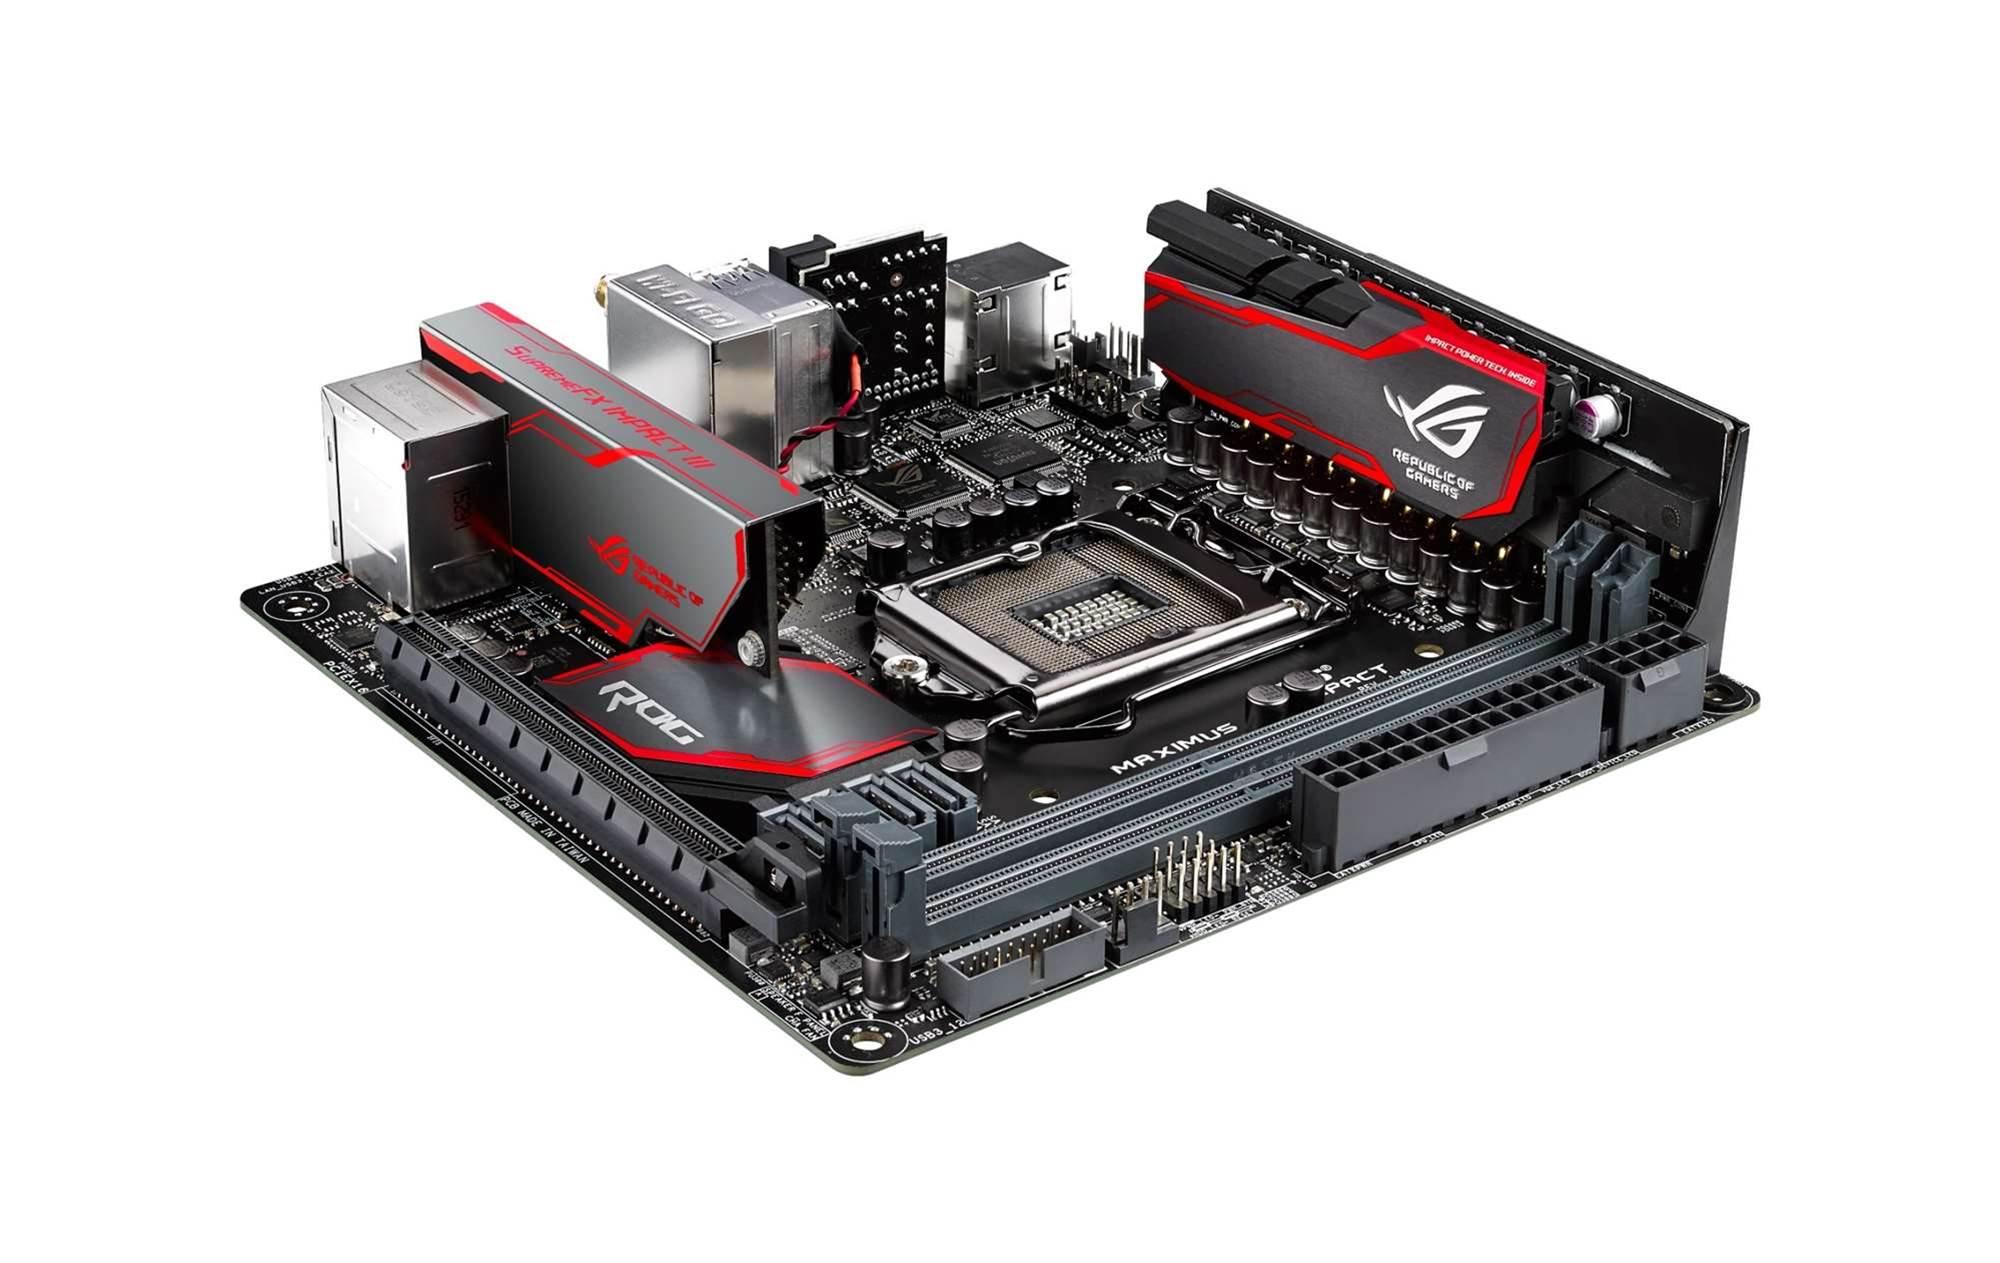 Asus reveals ROG Maximus VIII Impact motherboard